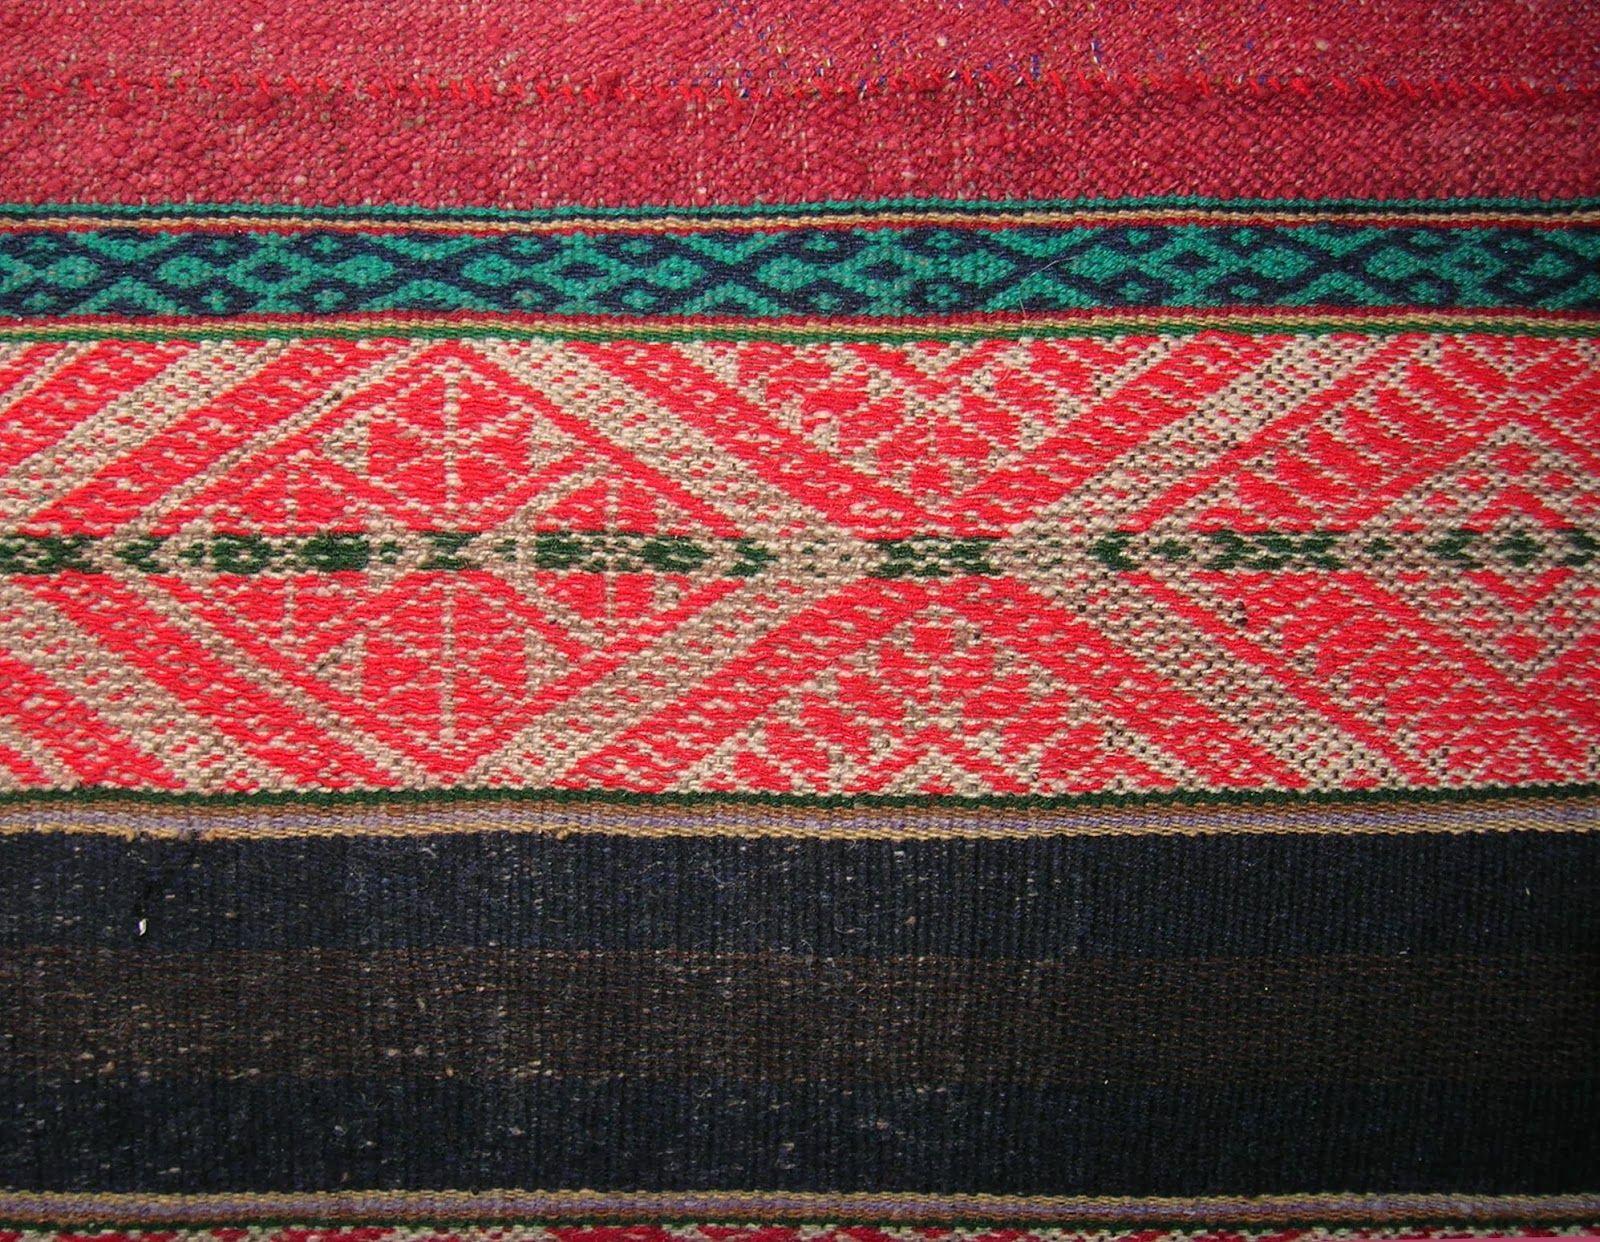 Mantos Incas Buscar Con Google Mantos Incas Peruvian Textiles